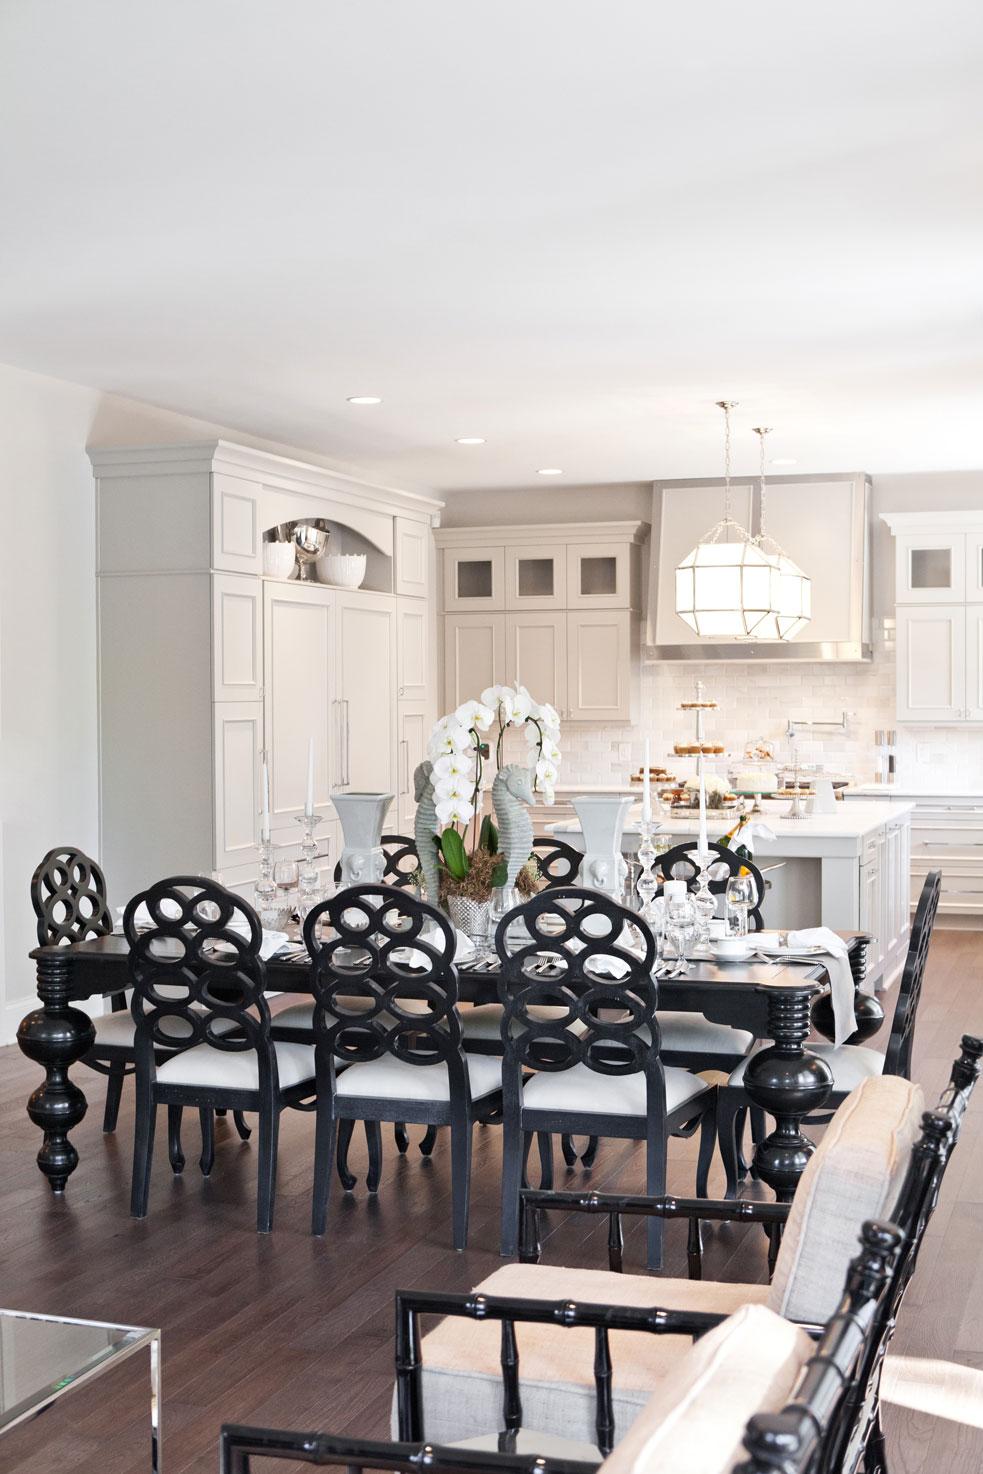 Courtney Casteel, Interior Design - Dining Room